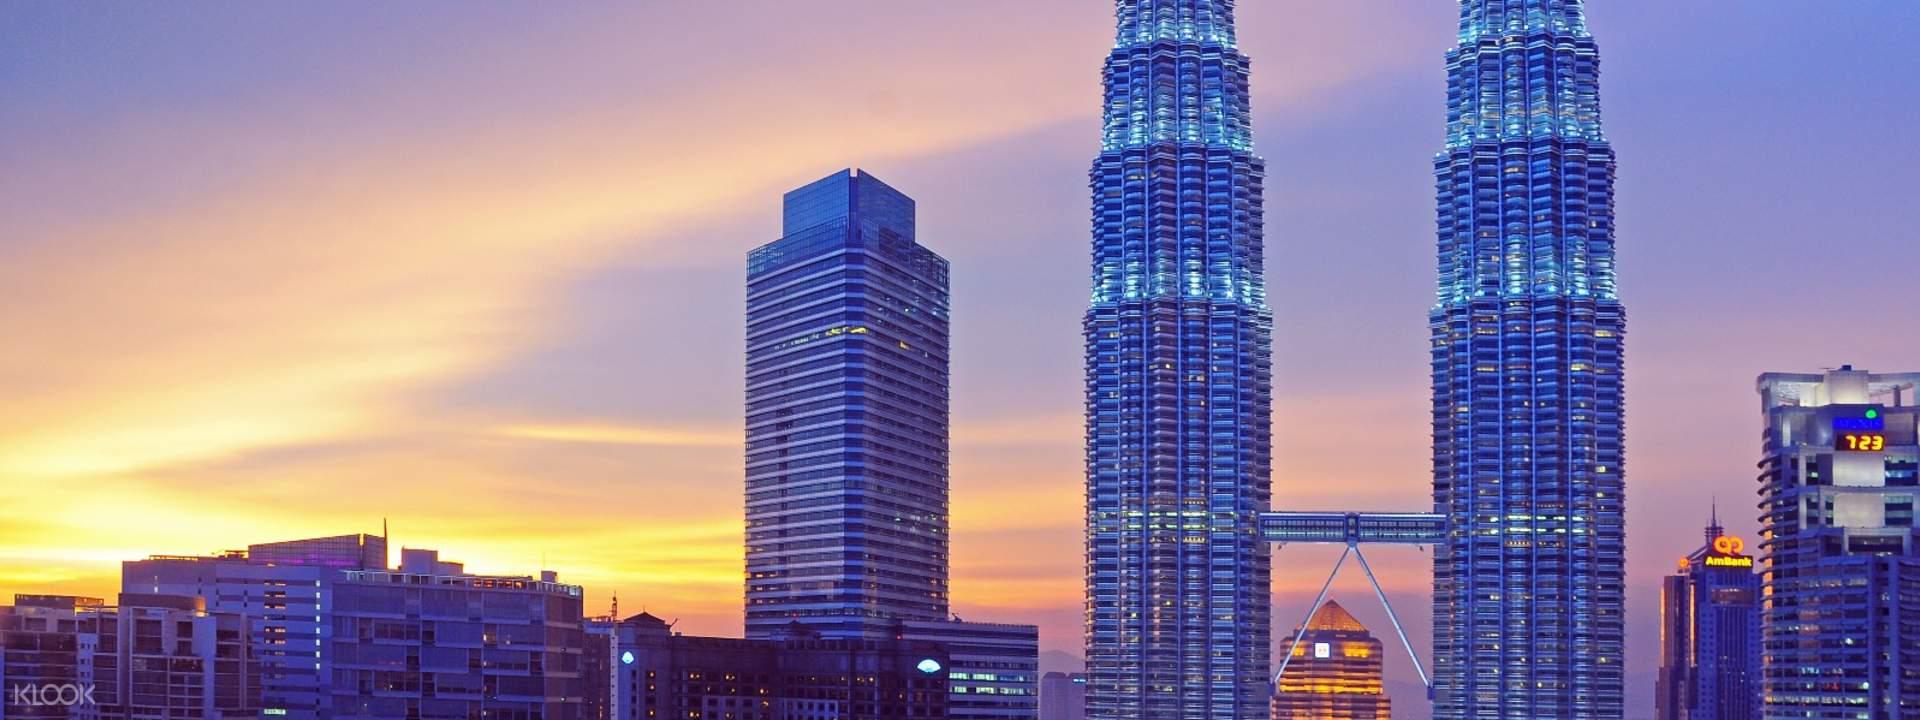 Petronas Twin Towers  Aquaria KLCC Admission Ticket